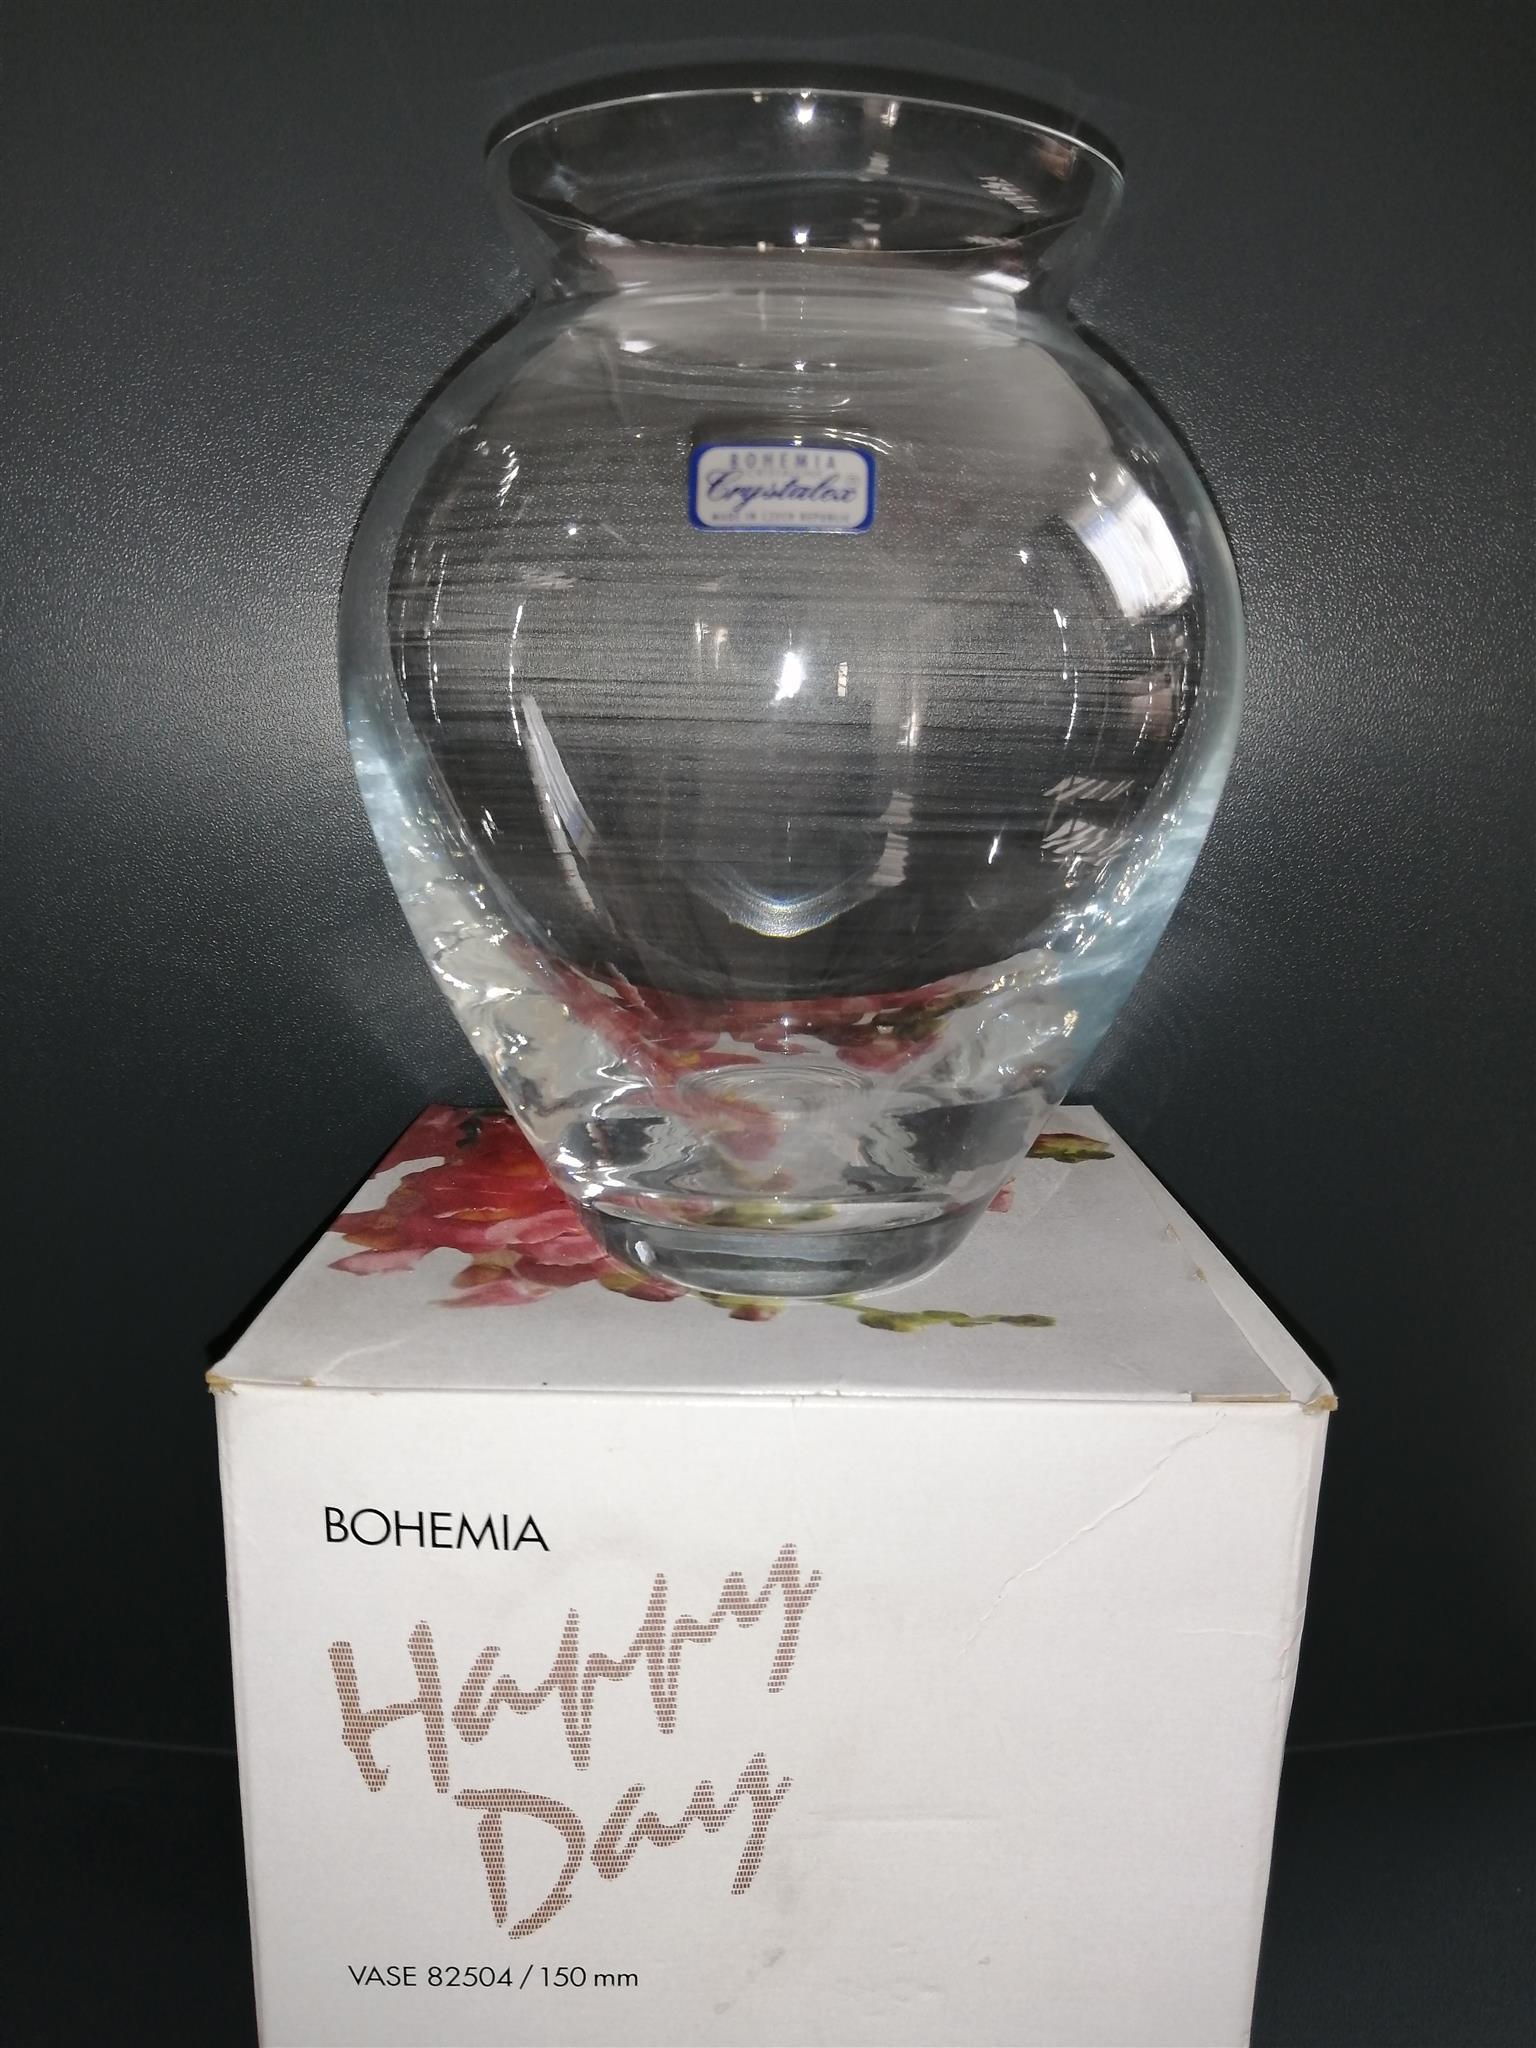 Bohemia Crystalex Vase - Produced in the Czech Republic